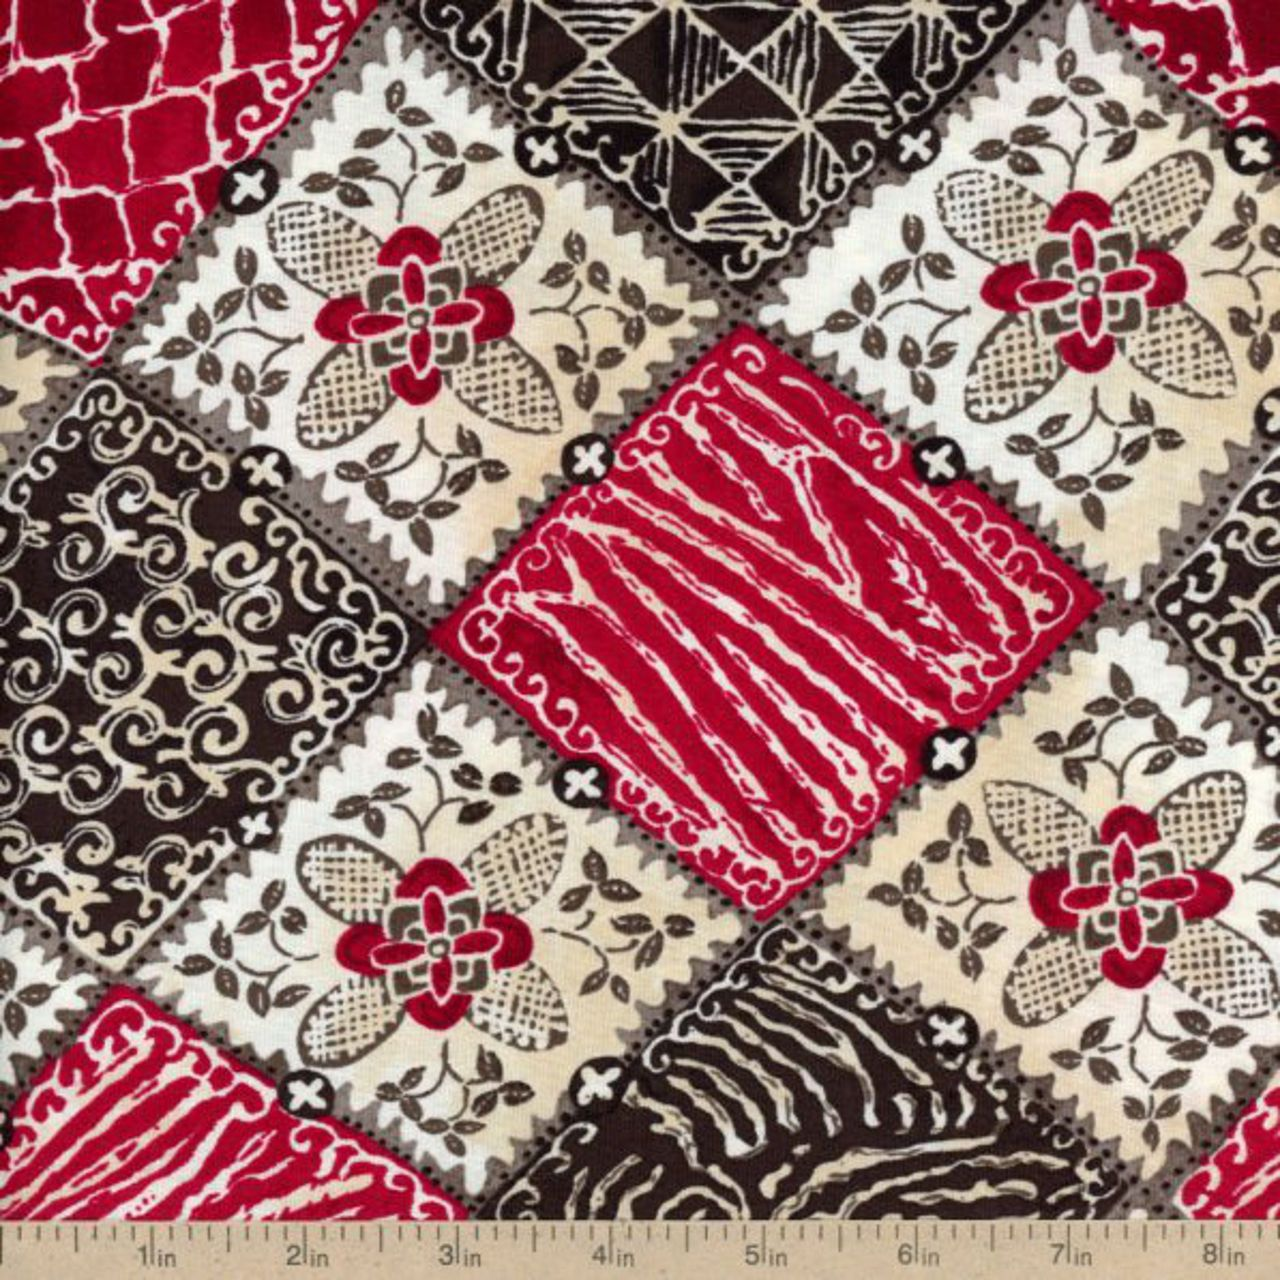 Marblehead Glistening Metallics Christmas by Ro Gregg 100/% Cotton Fabric